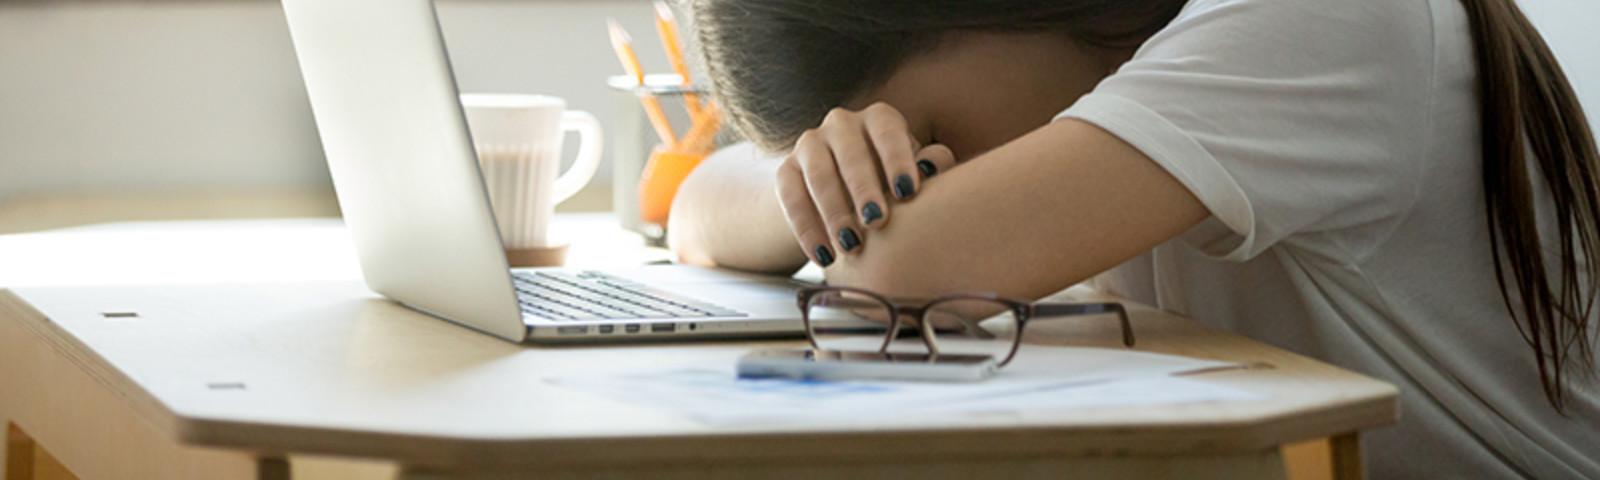 Sleep Deprivation Blog